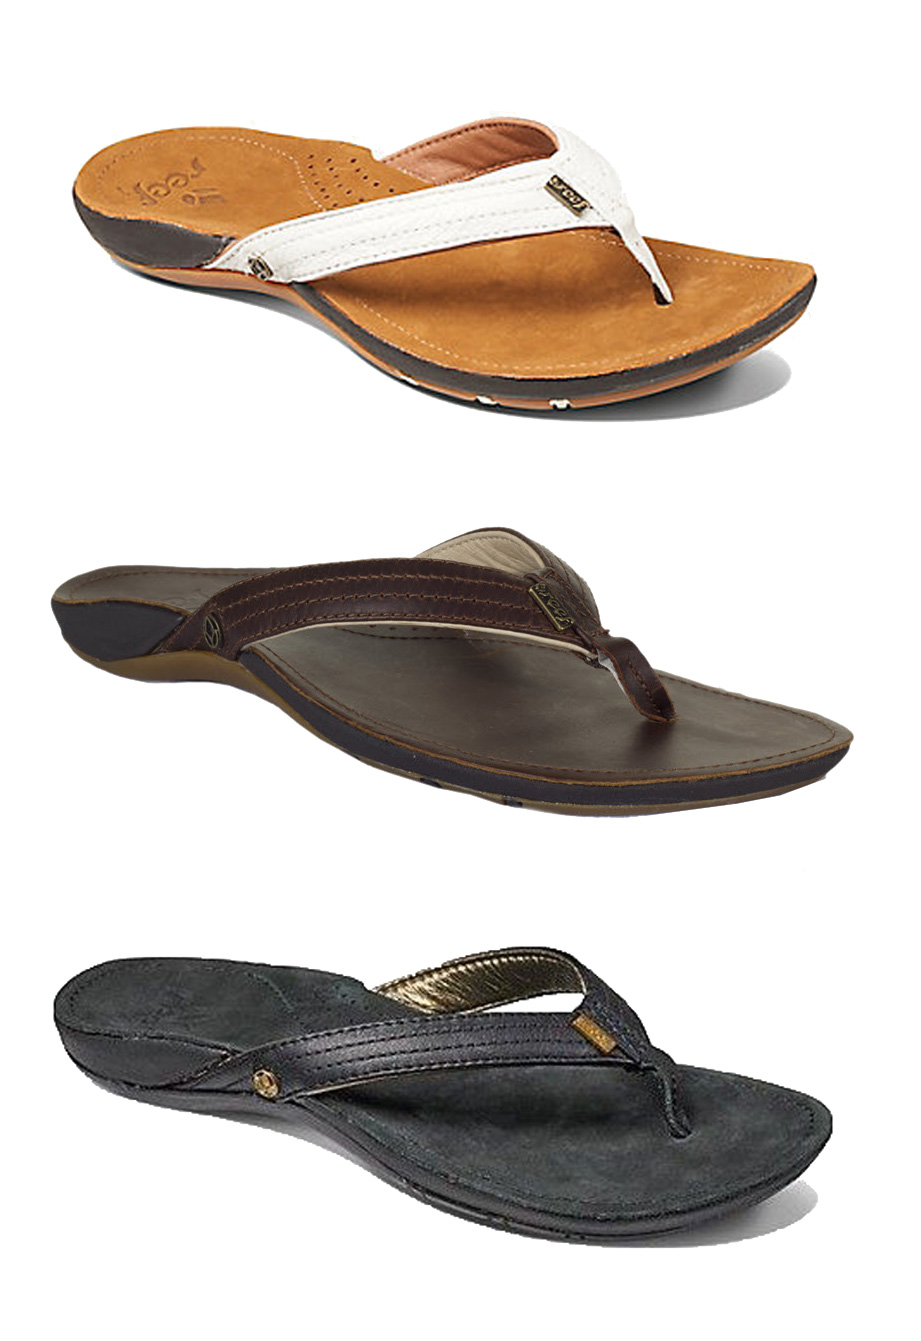 6257353d7 Details about Reef Womens Sandal - Miss J-Bay - Flip Flops